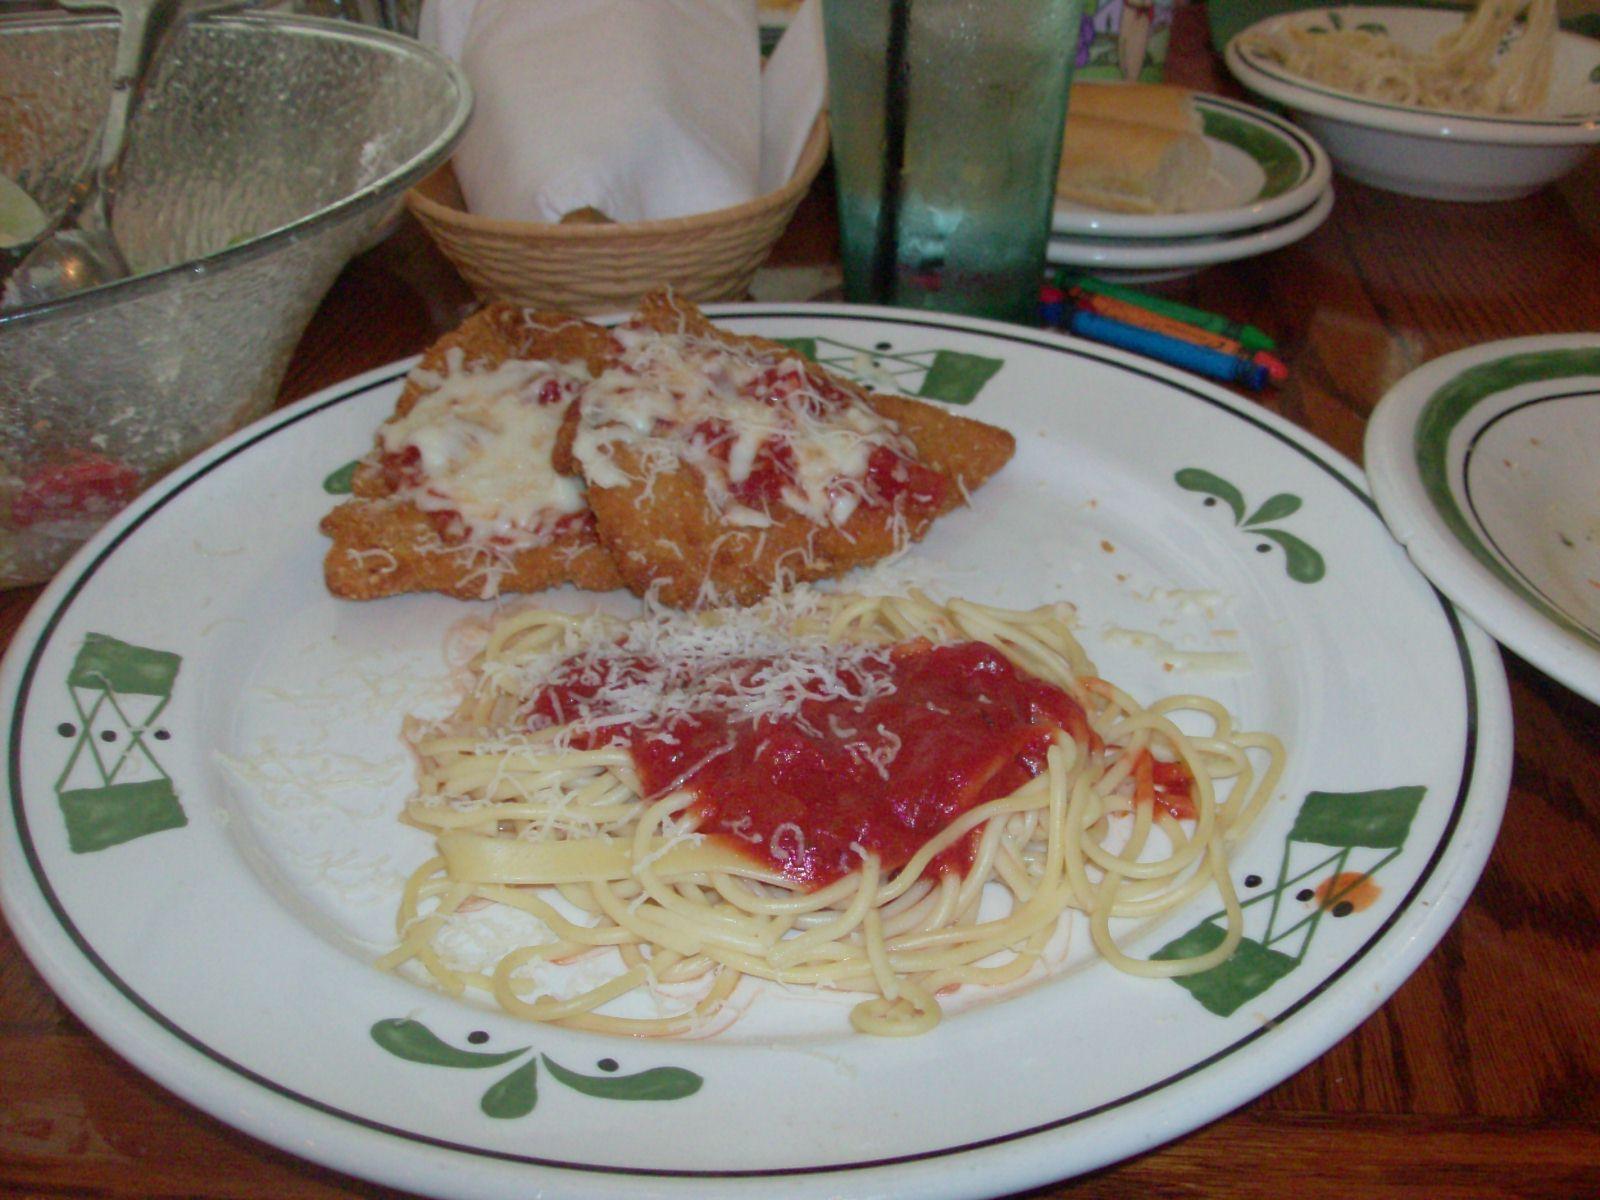 Olive Garden Copycat Recipes Chicken Parmigiana wasn't